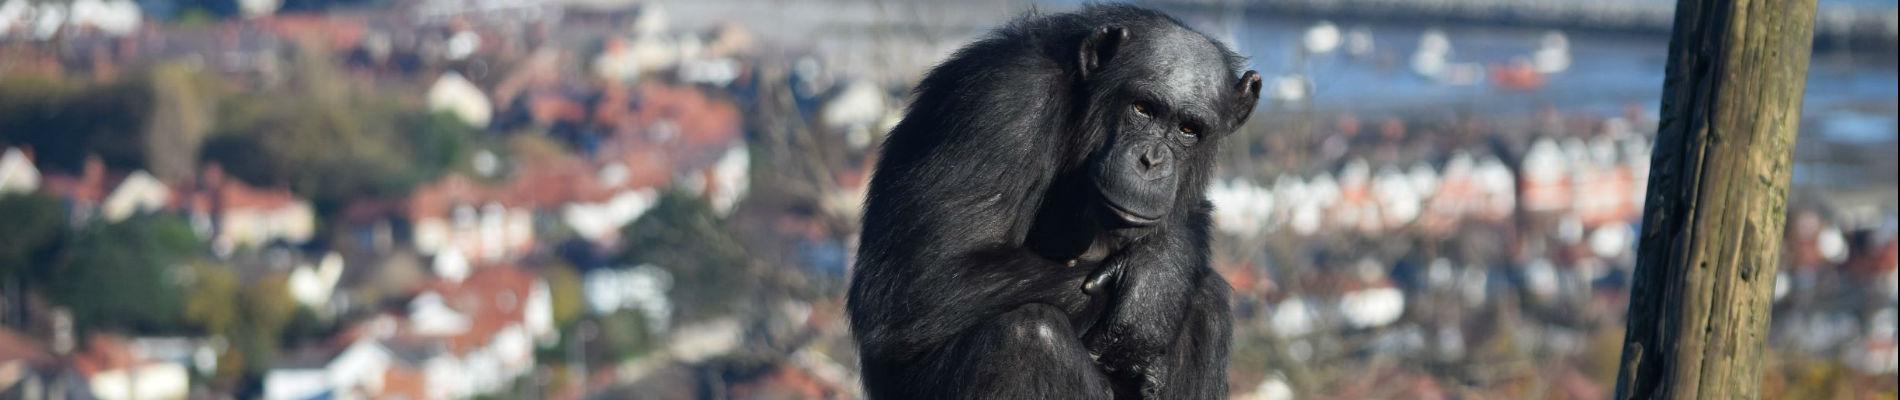 People & Primates